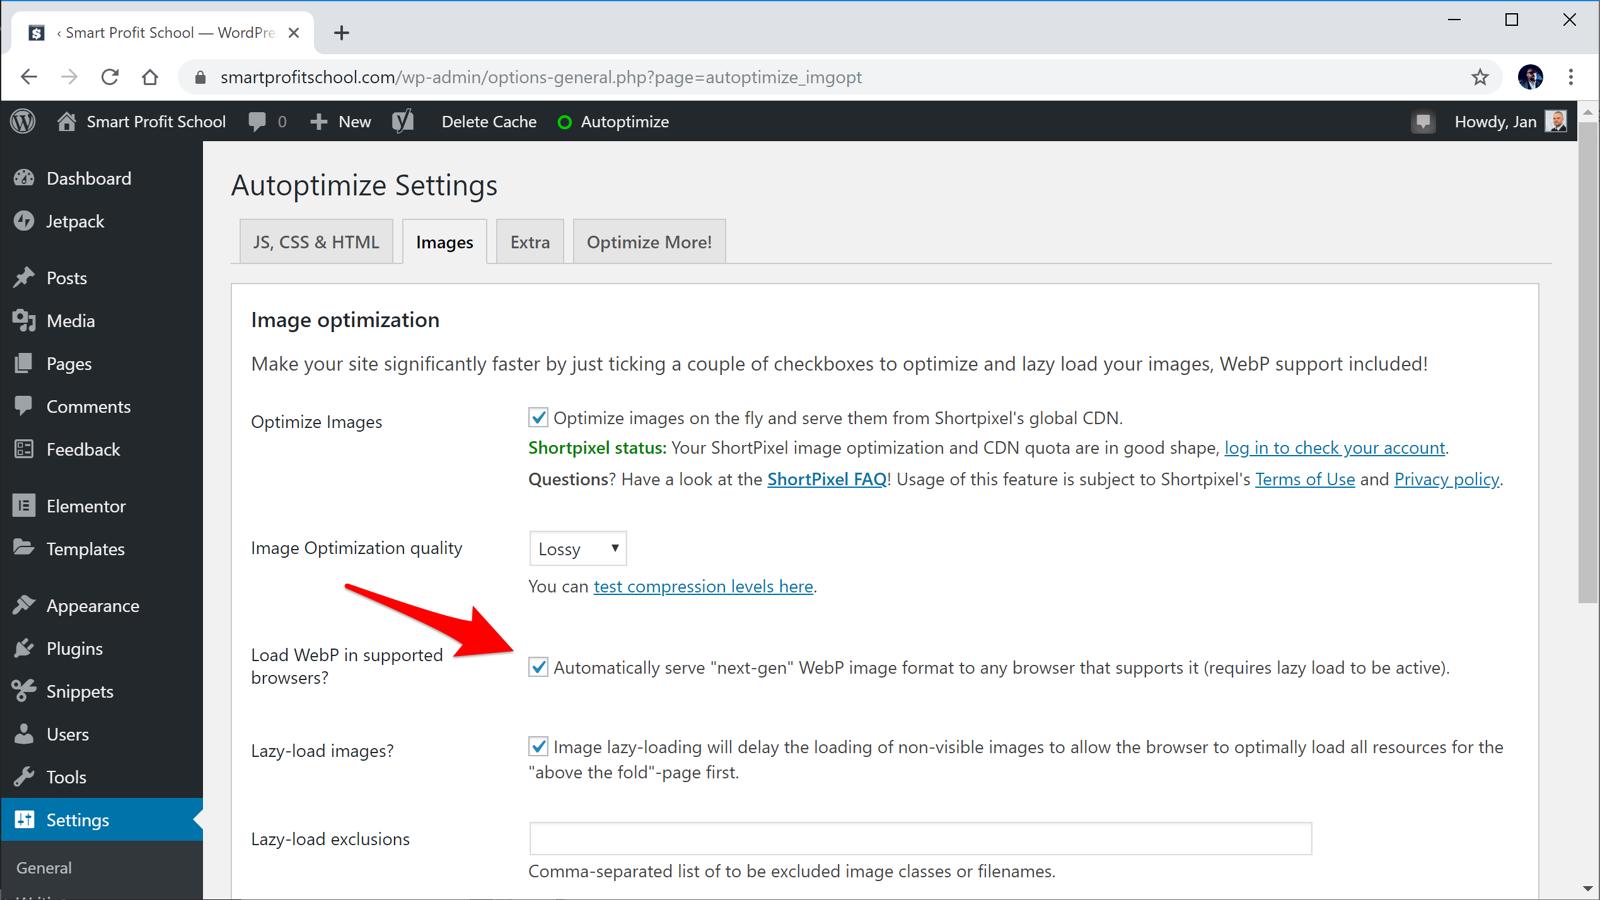 Load WebP settings in Autoptimize